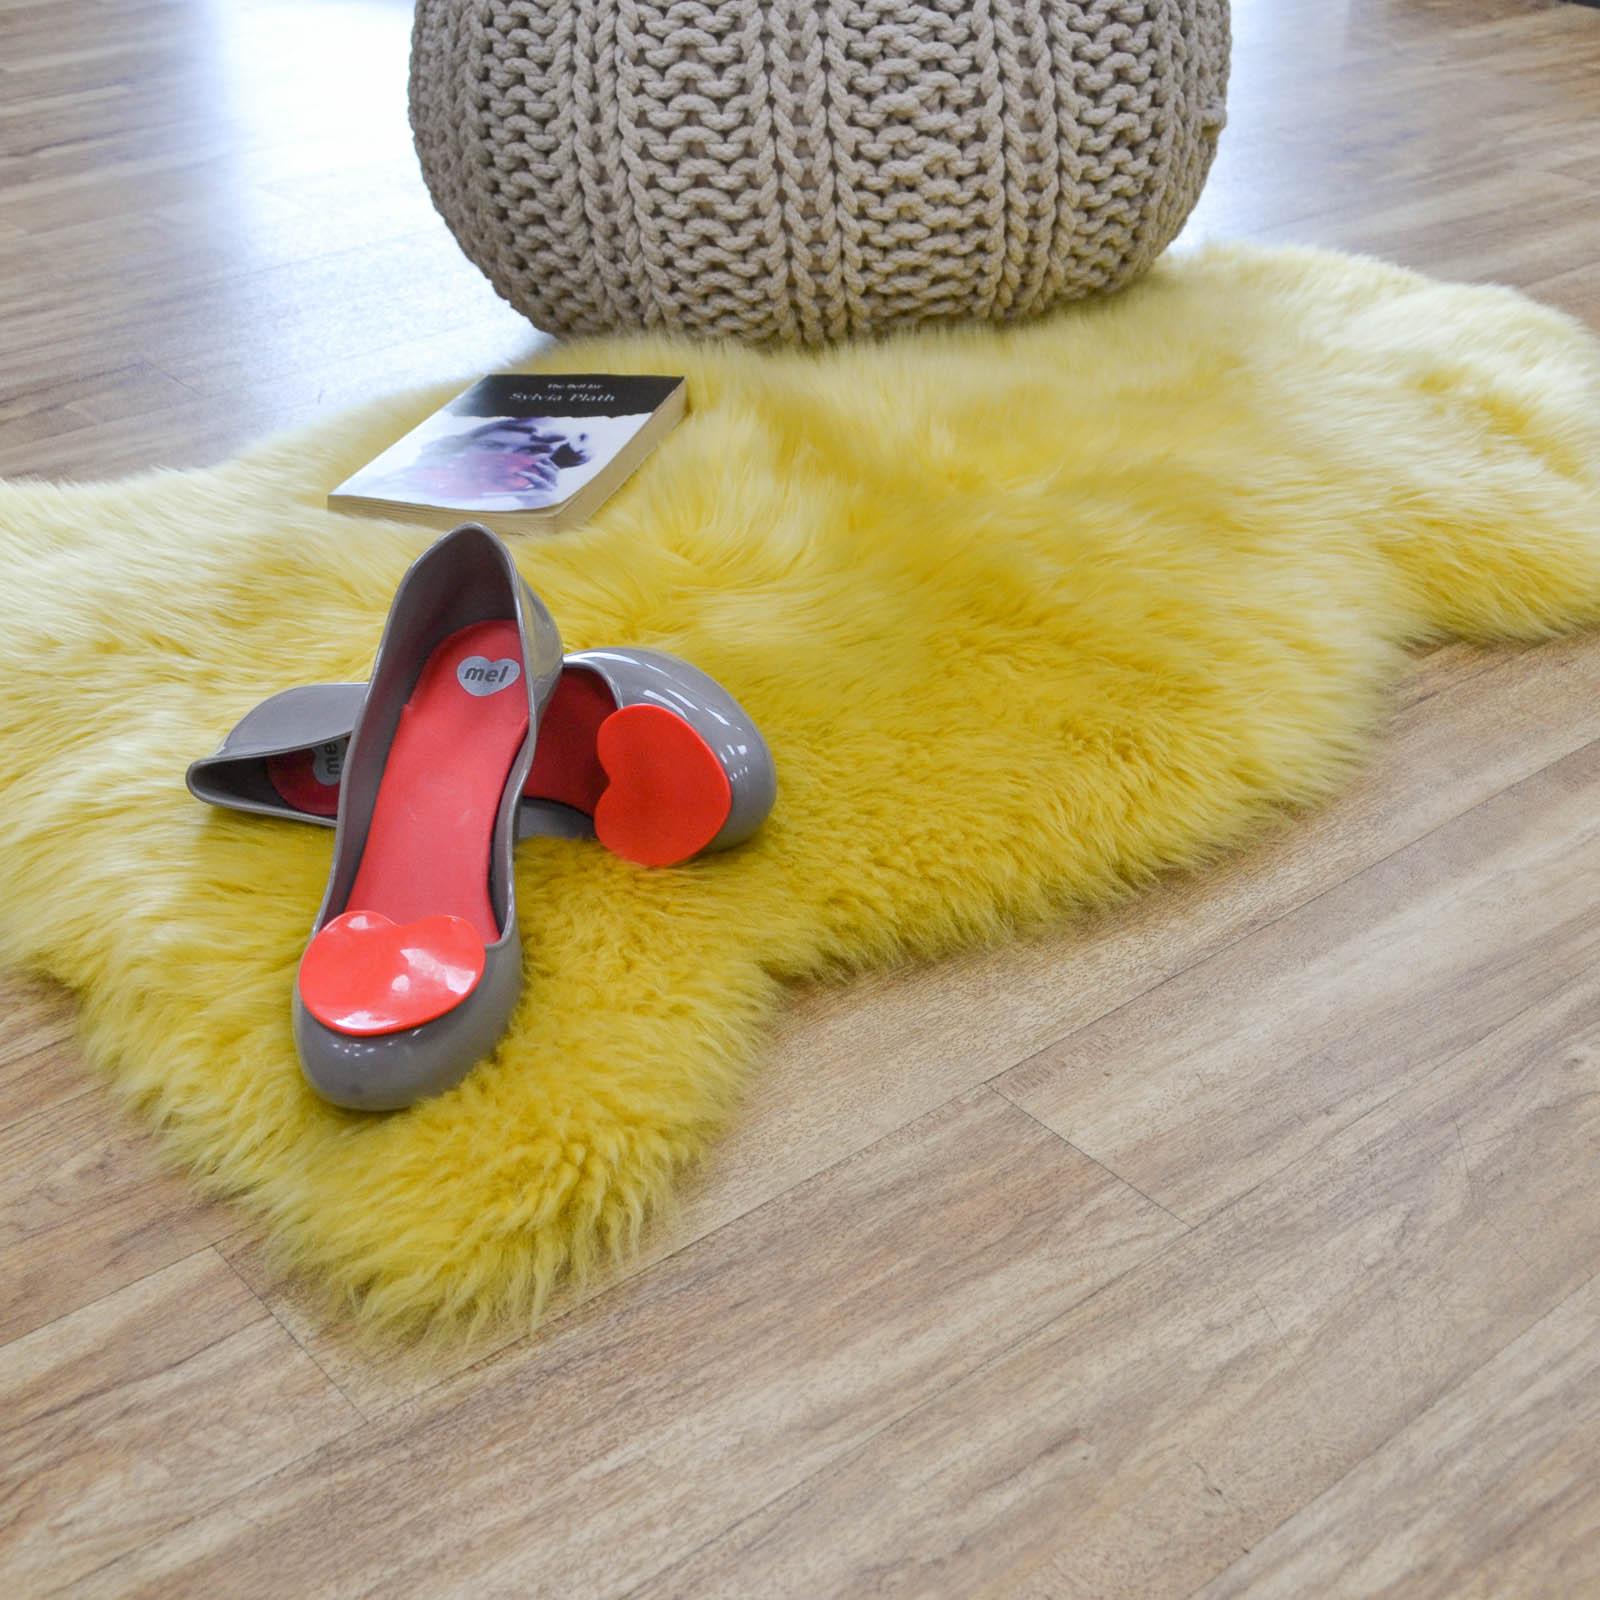 sheepskin rugs new zealand quality mustard free uk. Black Bedroom Furniture Sets. Home Design Ideas